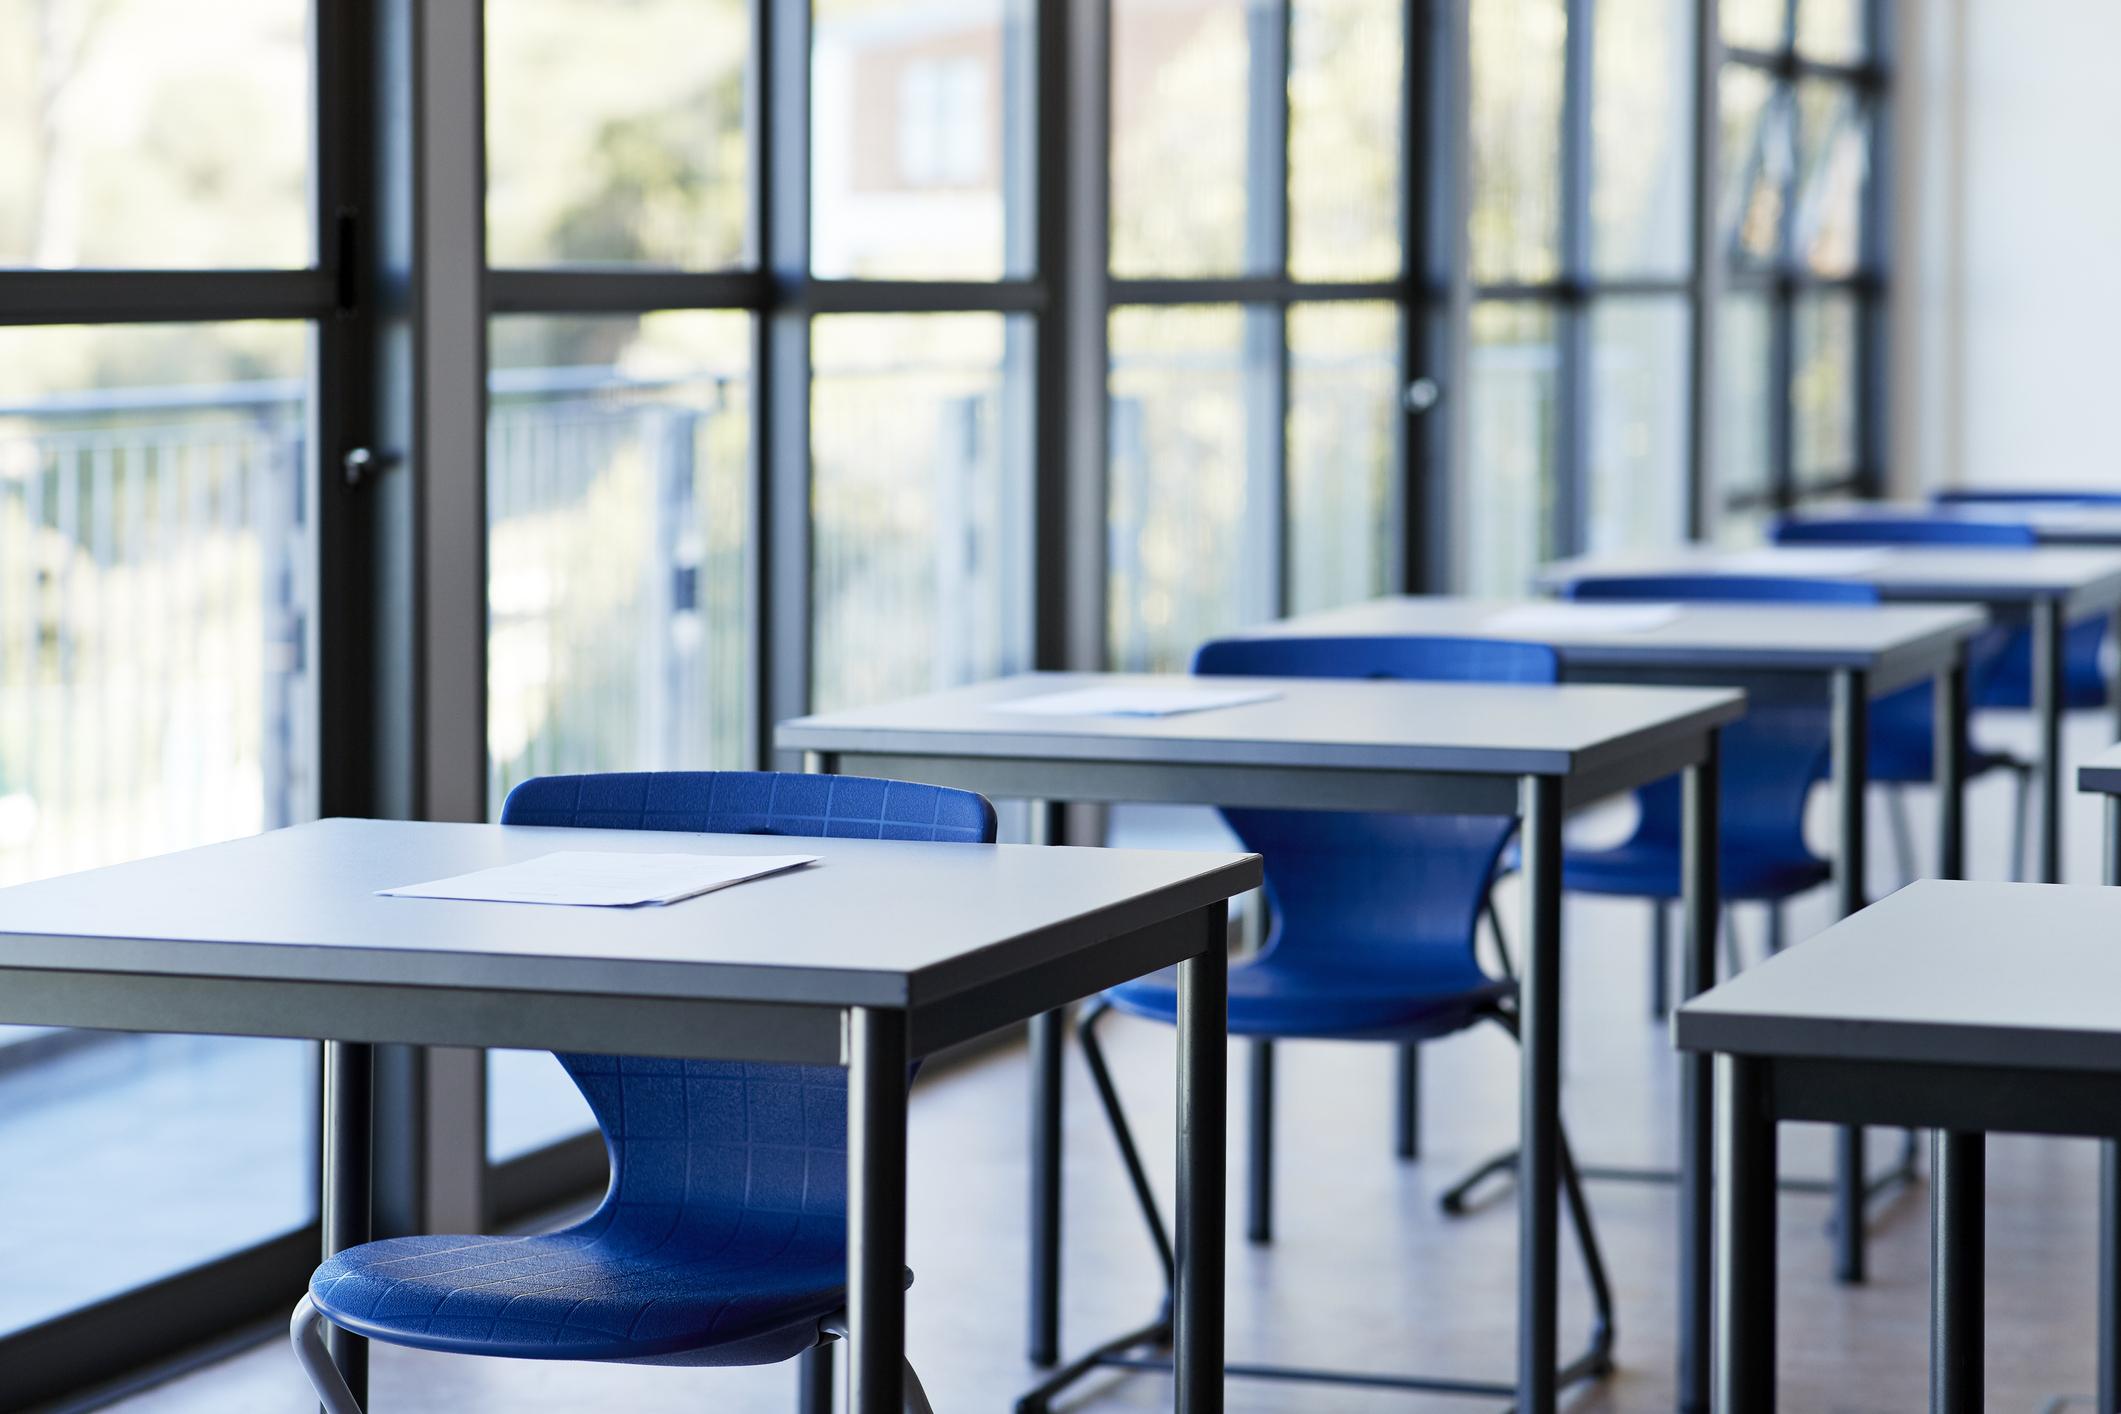 When will schools open again the UK following the coronavirus pandemic?